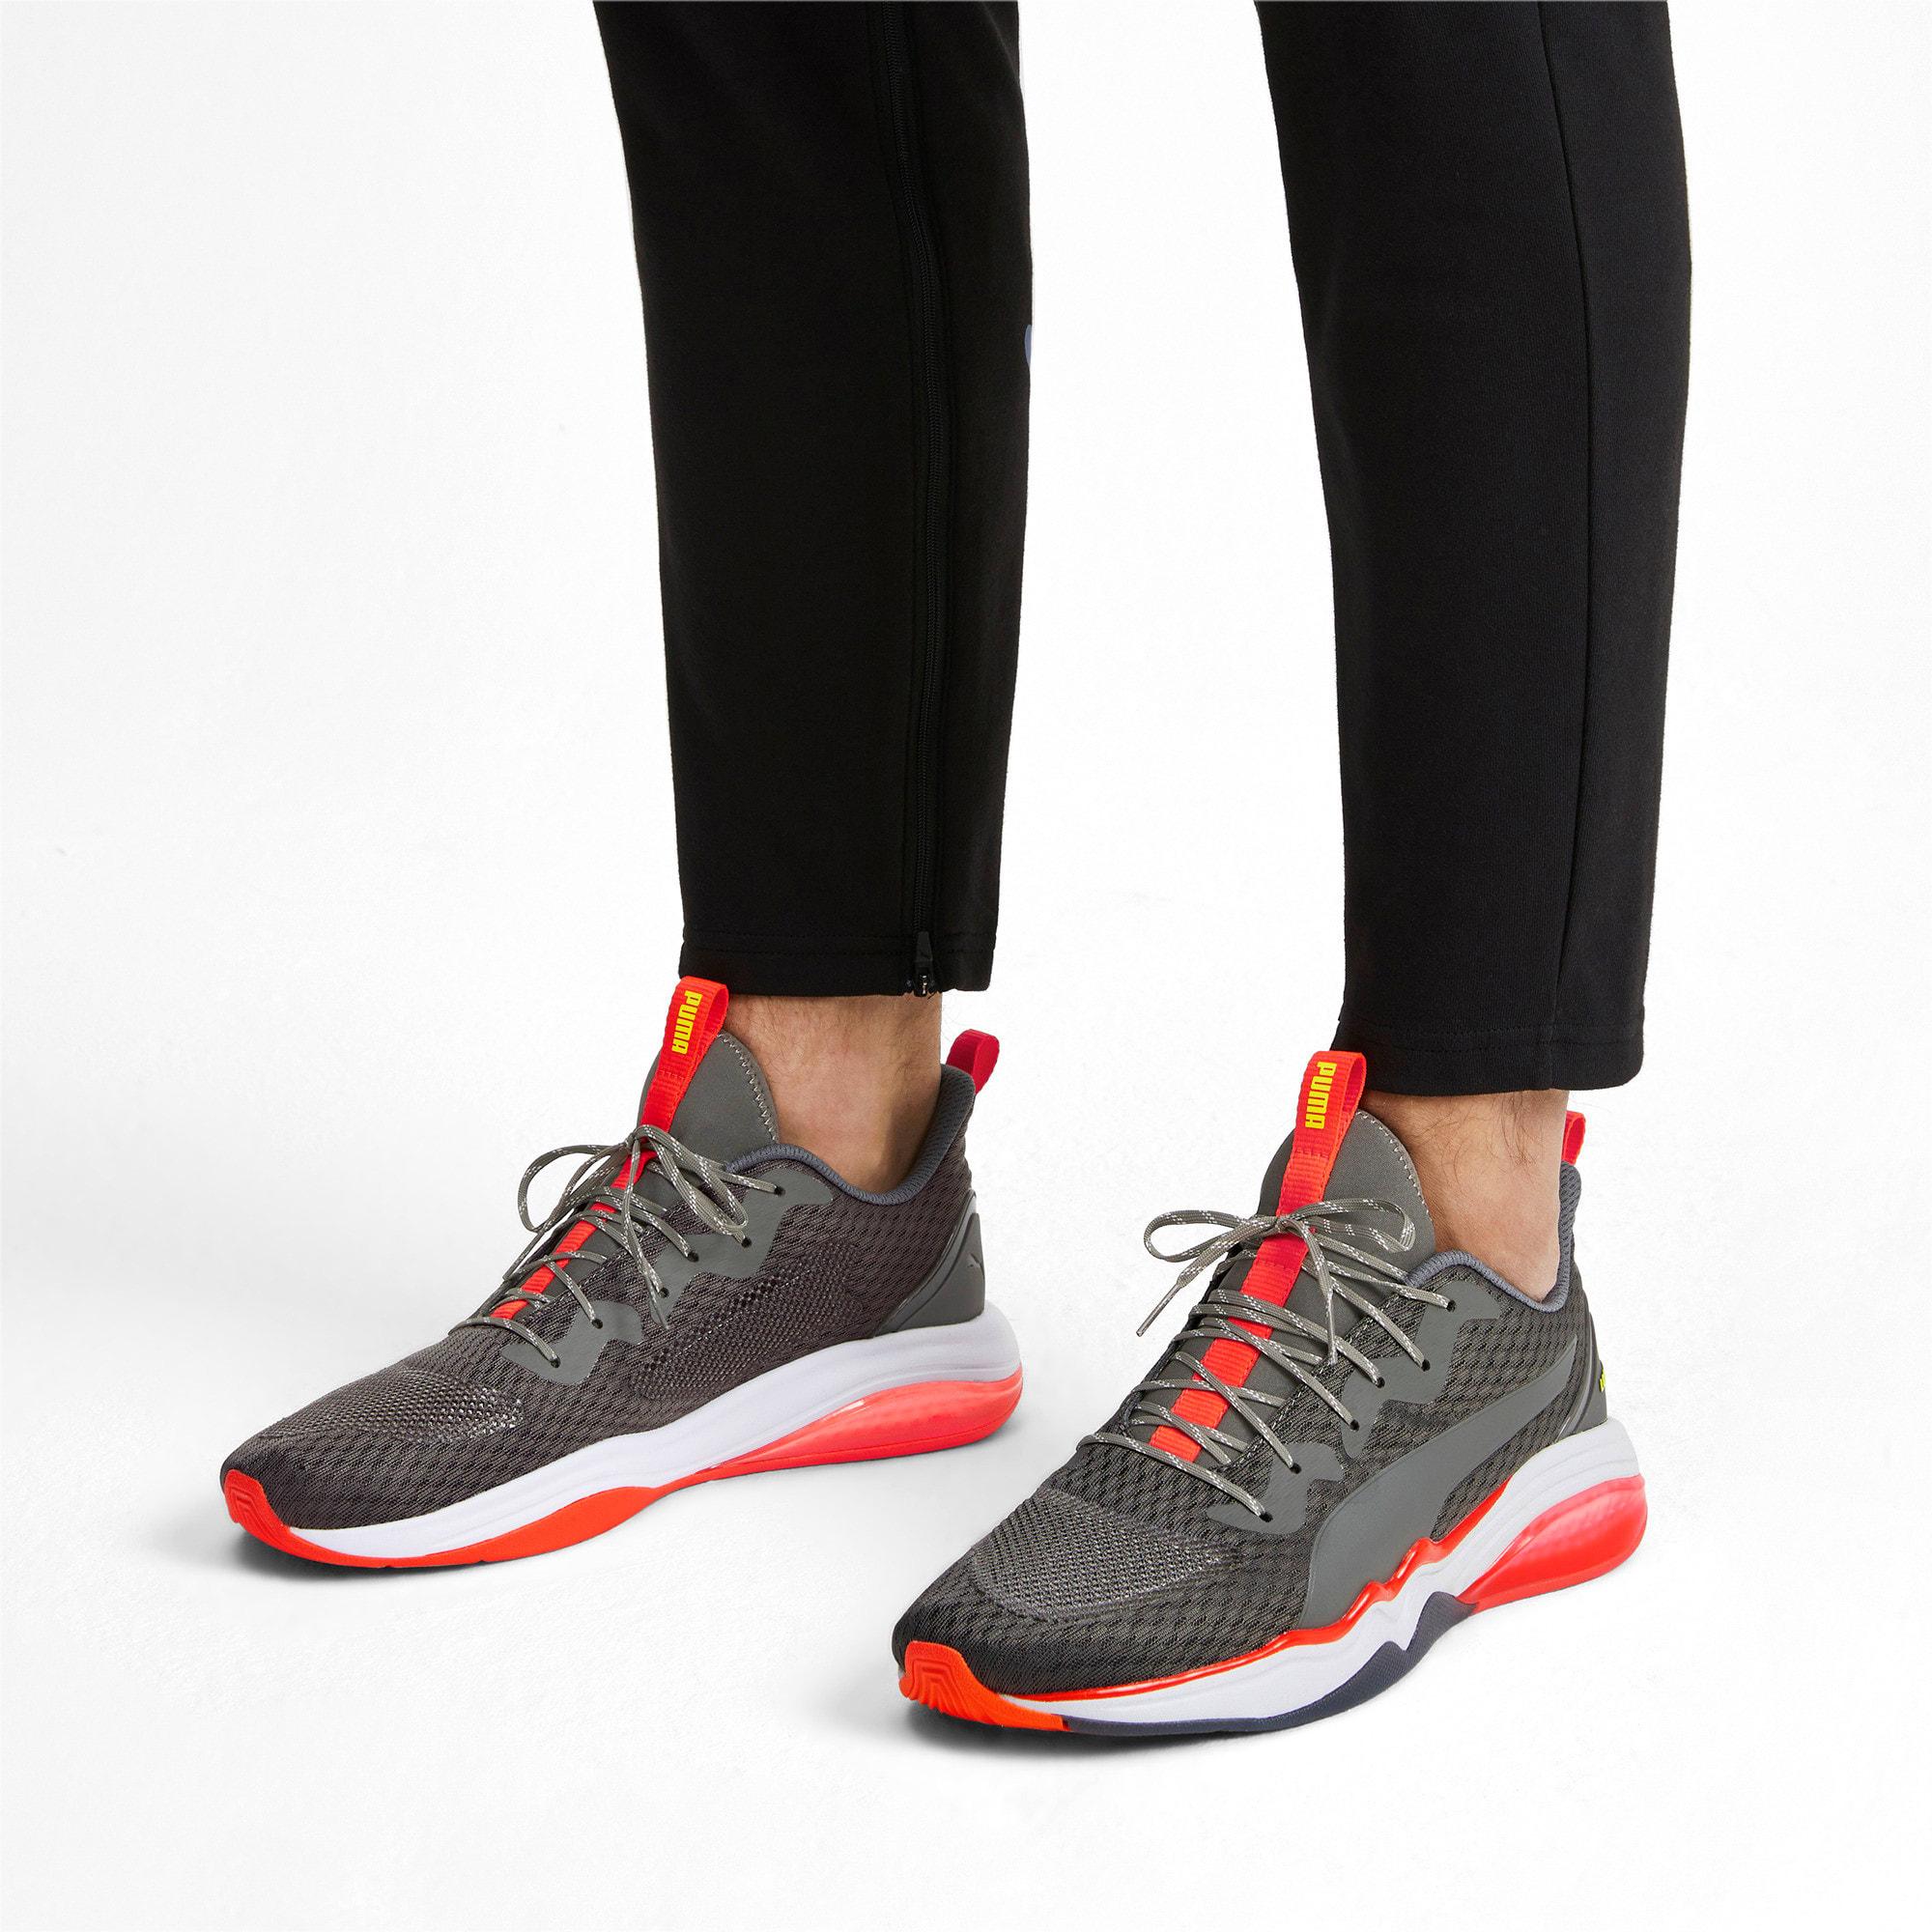 Thumbnail 3 of LQDCELL Tension Men's Training Shoes, CASTLEROCK-Nrgy Red-Y Alert, medium